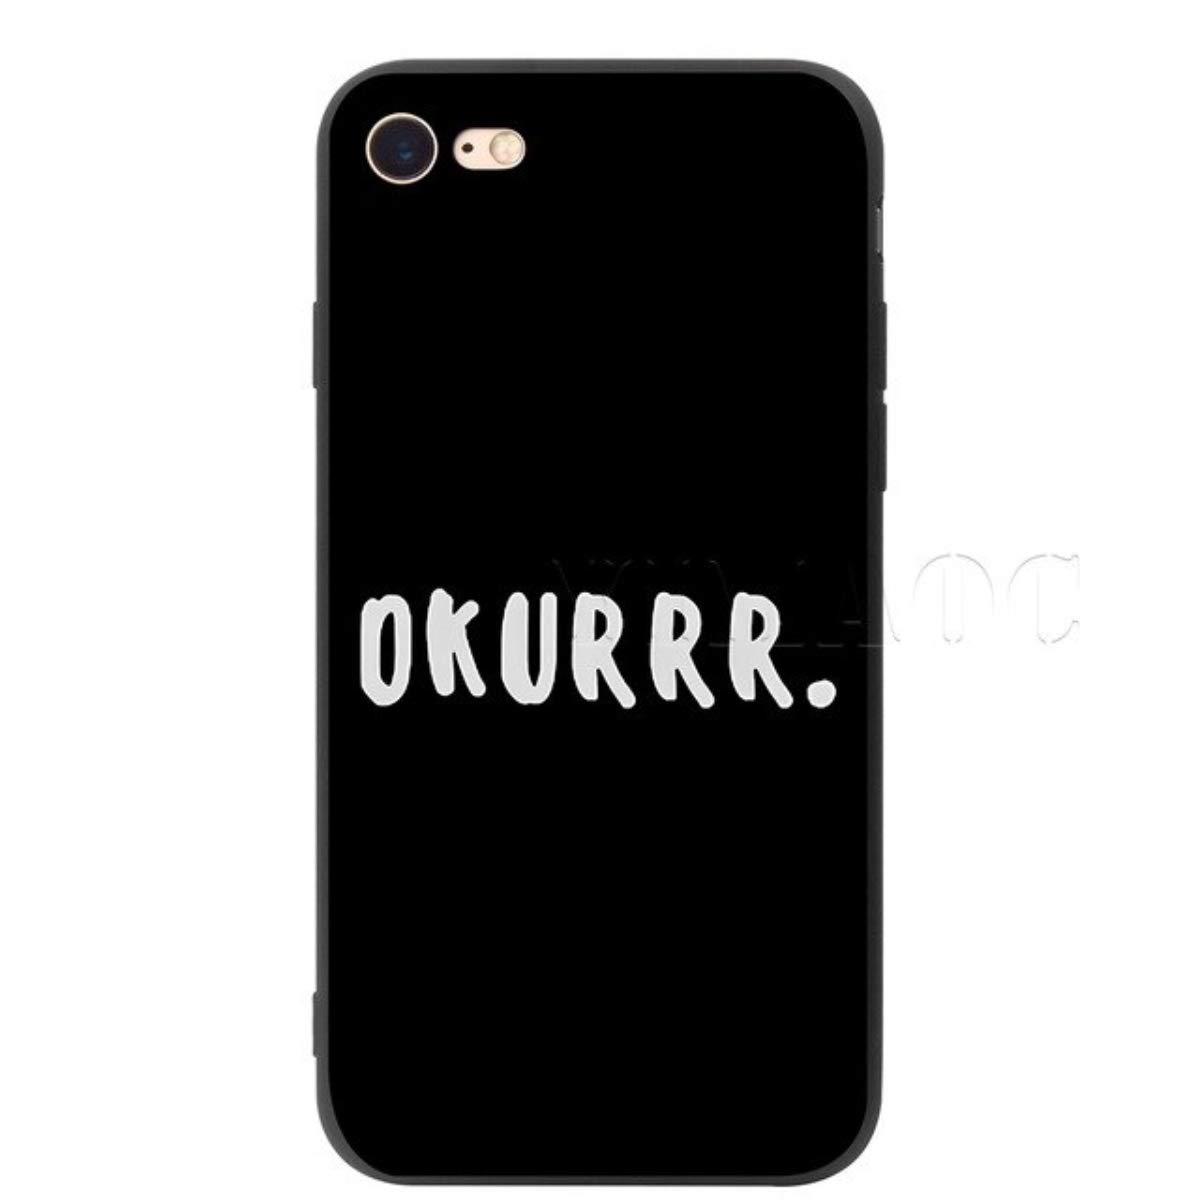 Cardi B, OKURRRR Silicone Phone case for Men and Women (iPhone 5/5s/5SE)